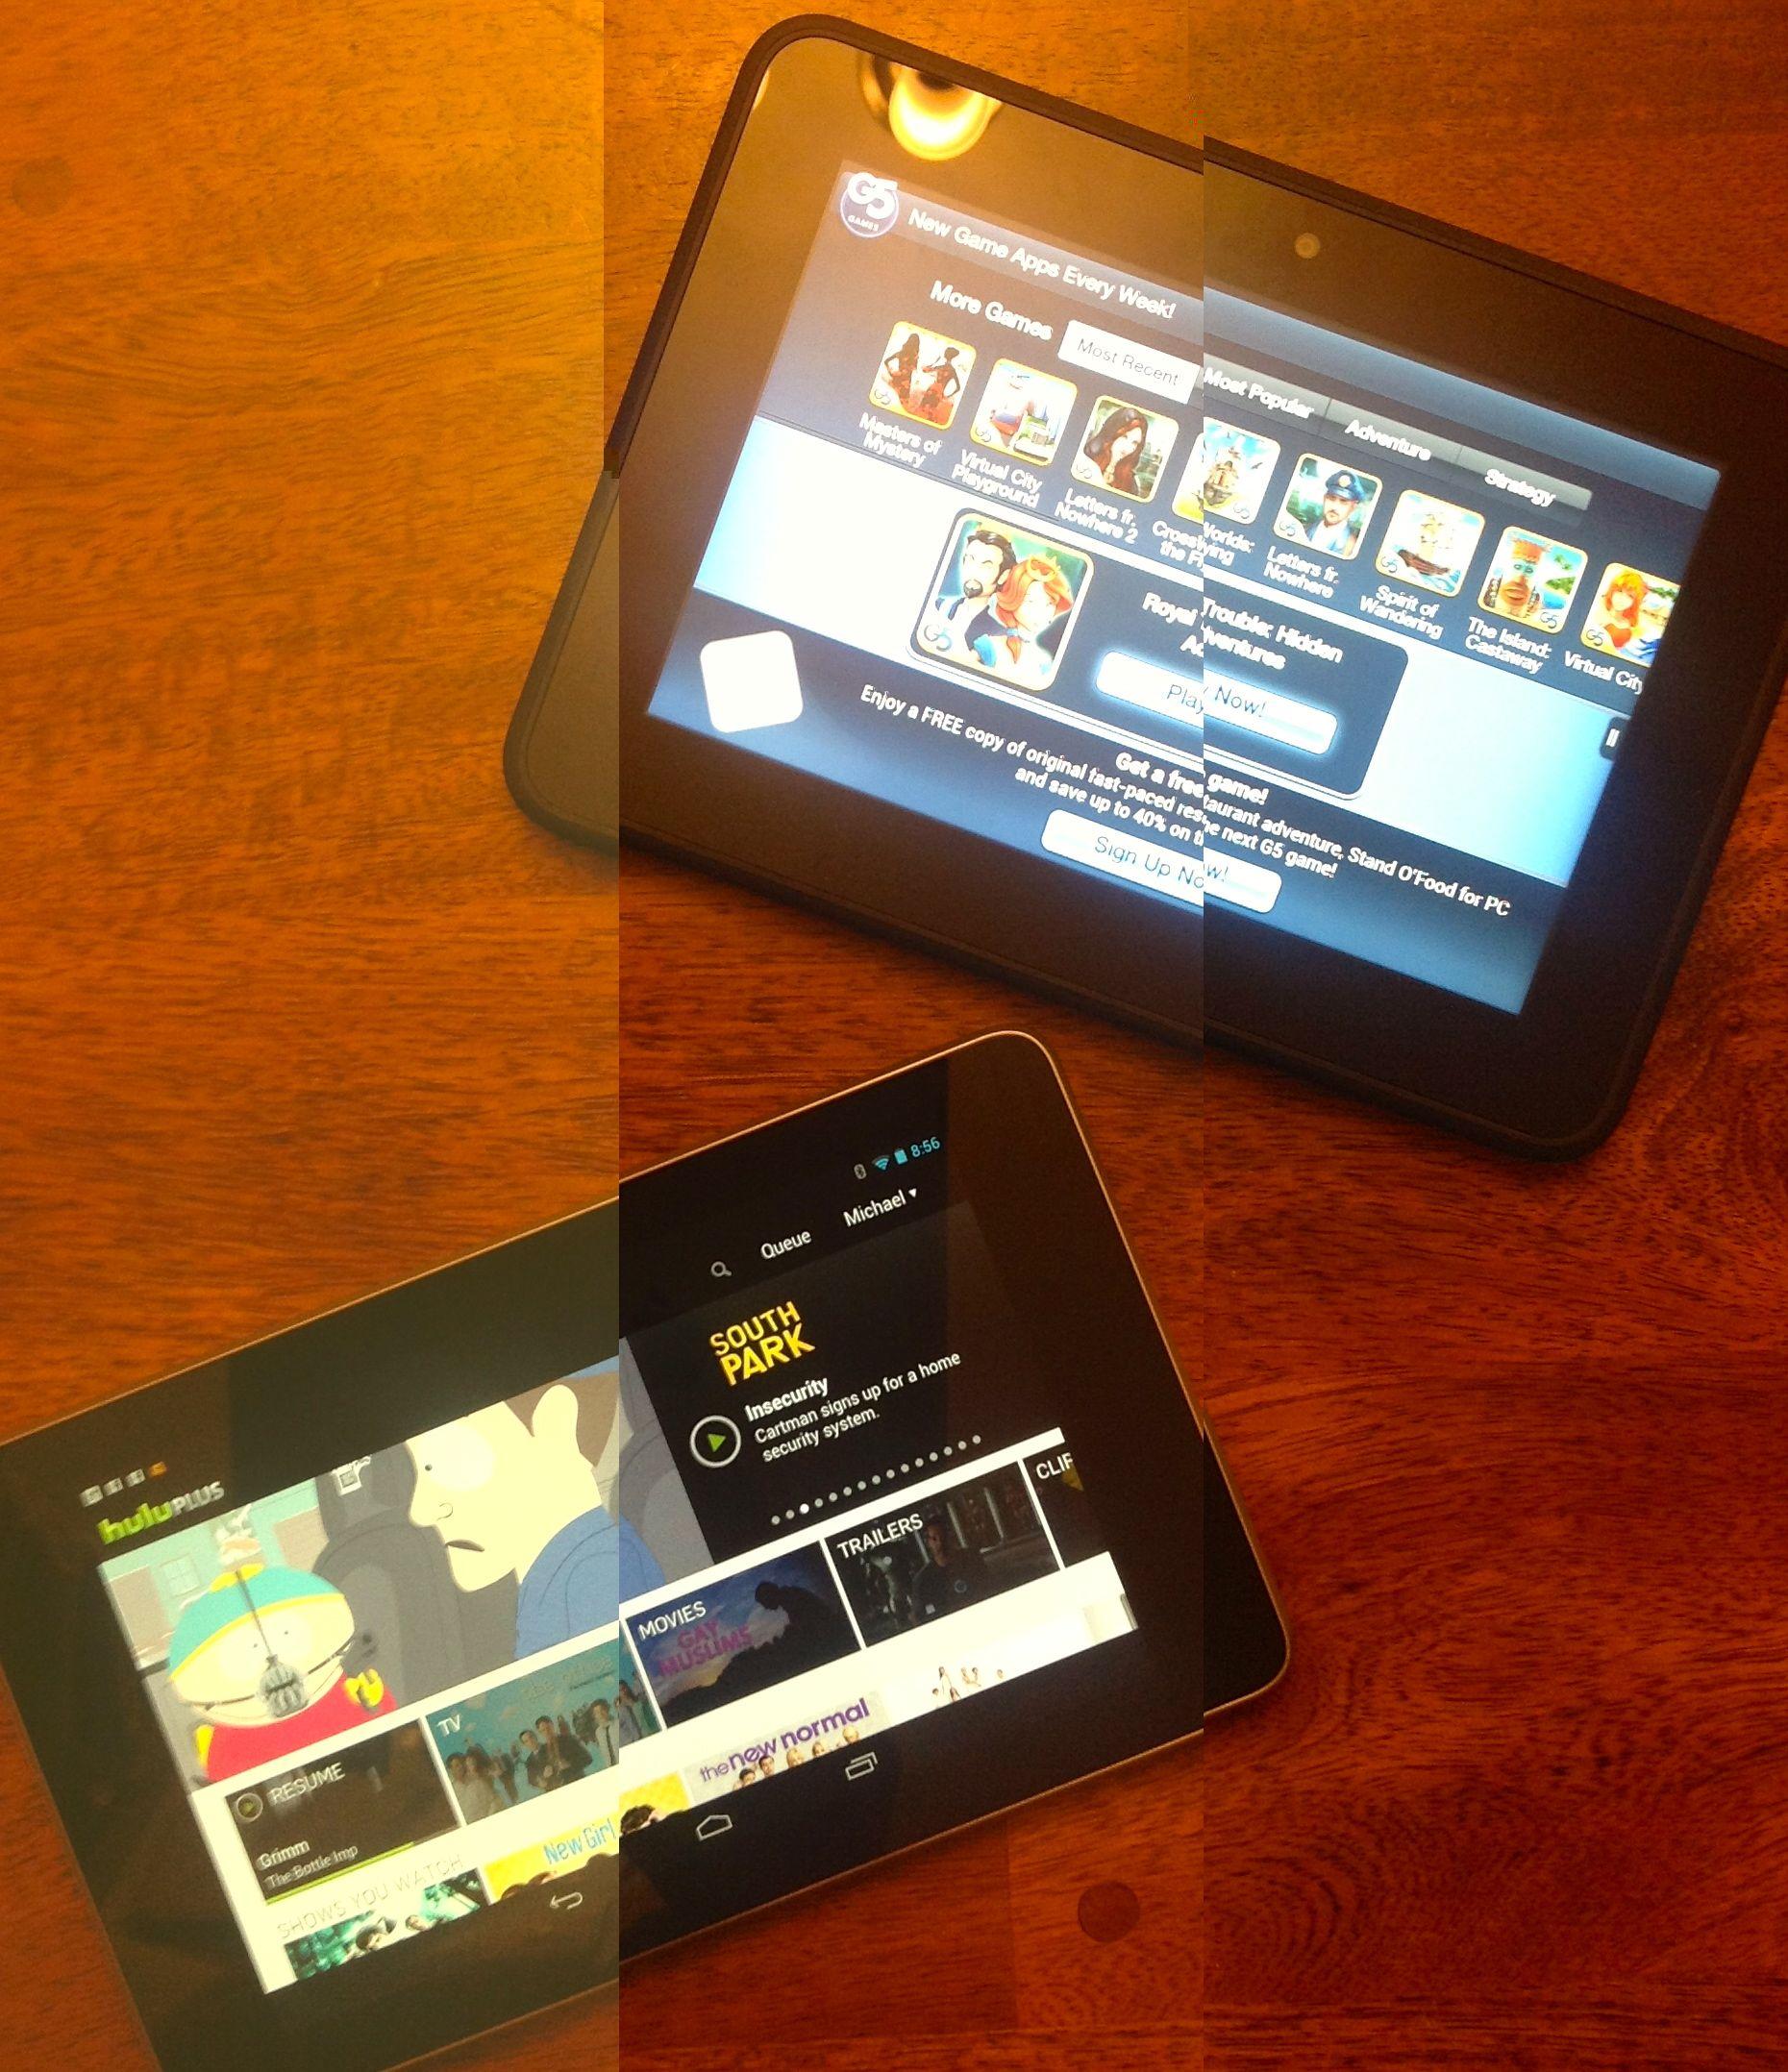 Roku Kindle Google eReaders Apple TV Android